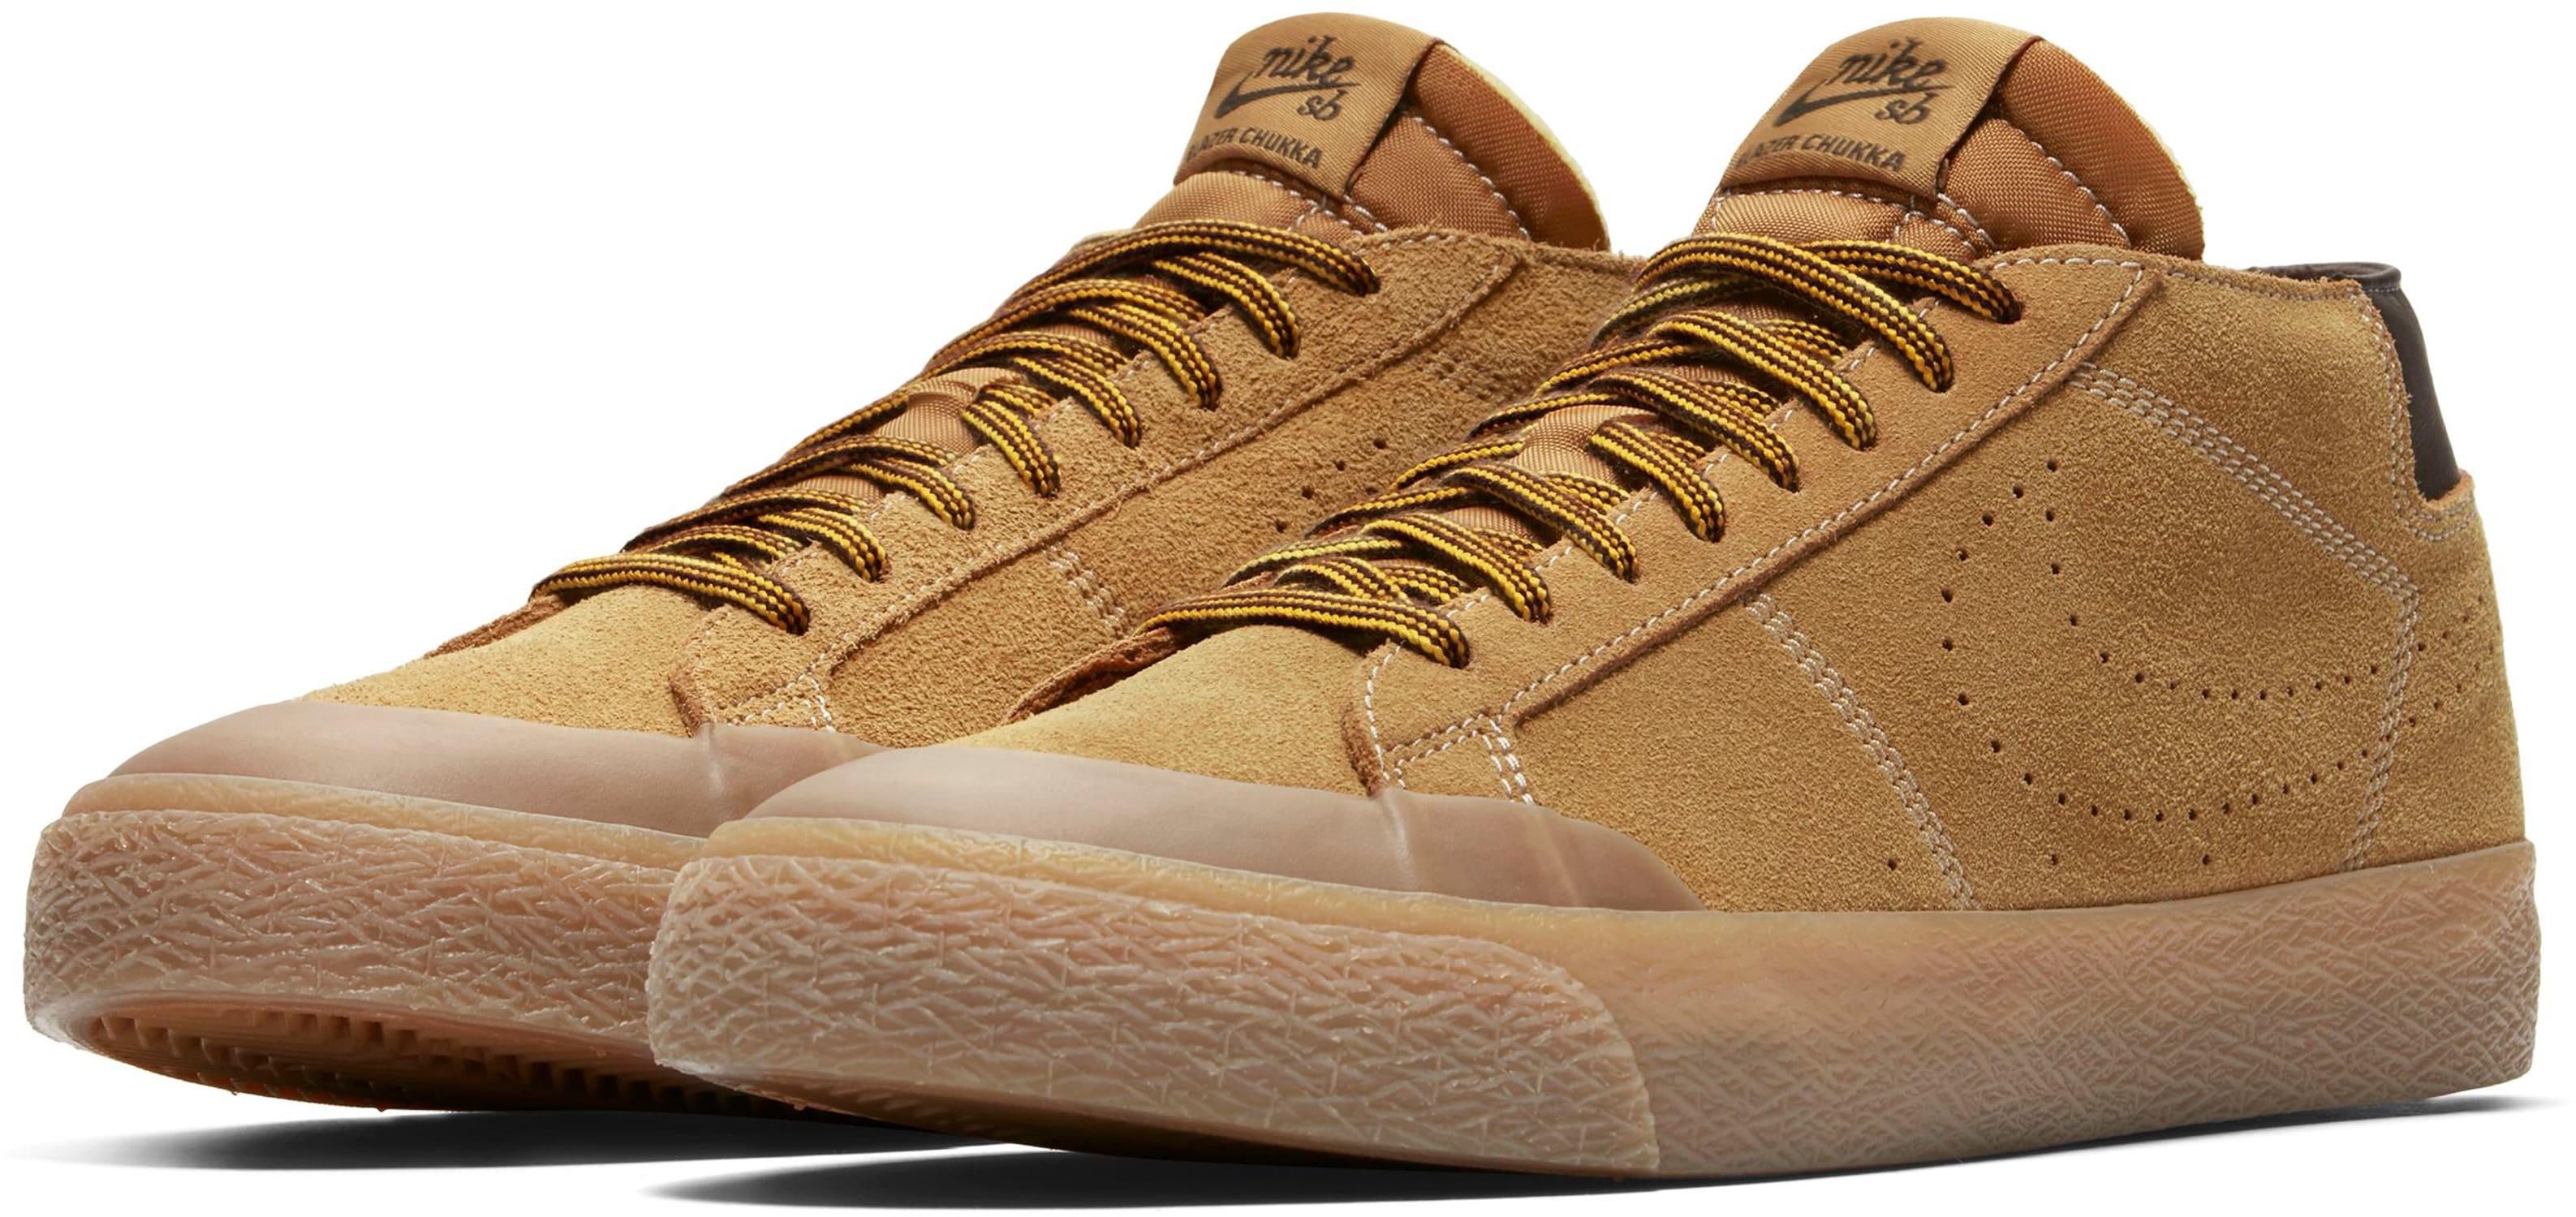 Zoom Blazer Nike Skate Premium Xt Chukka Shoes Sb gb6vIYfy7